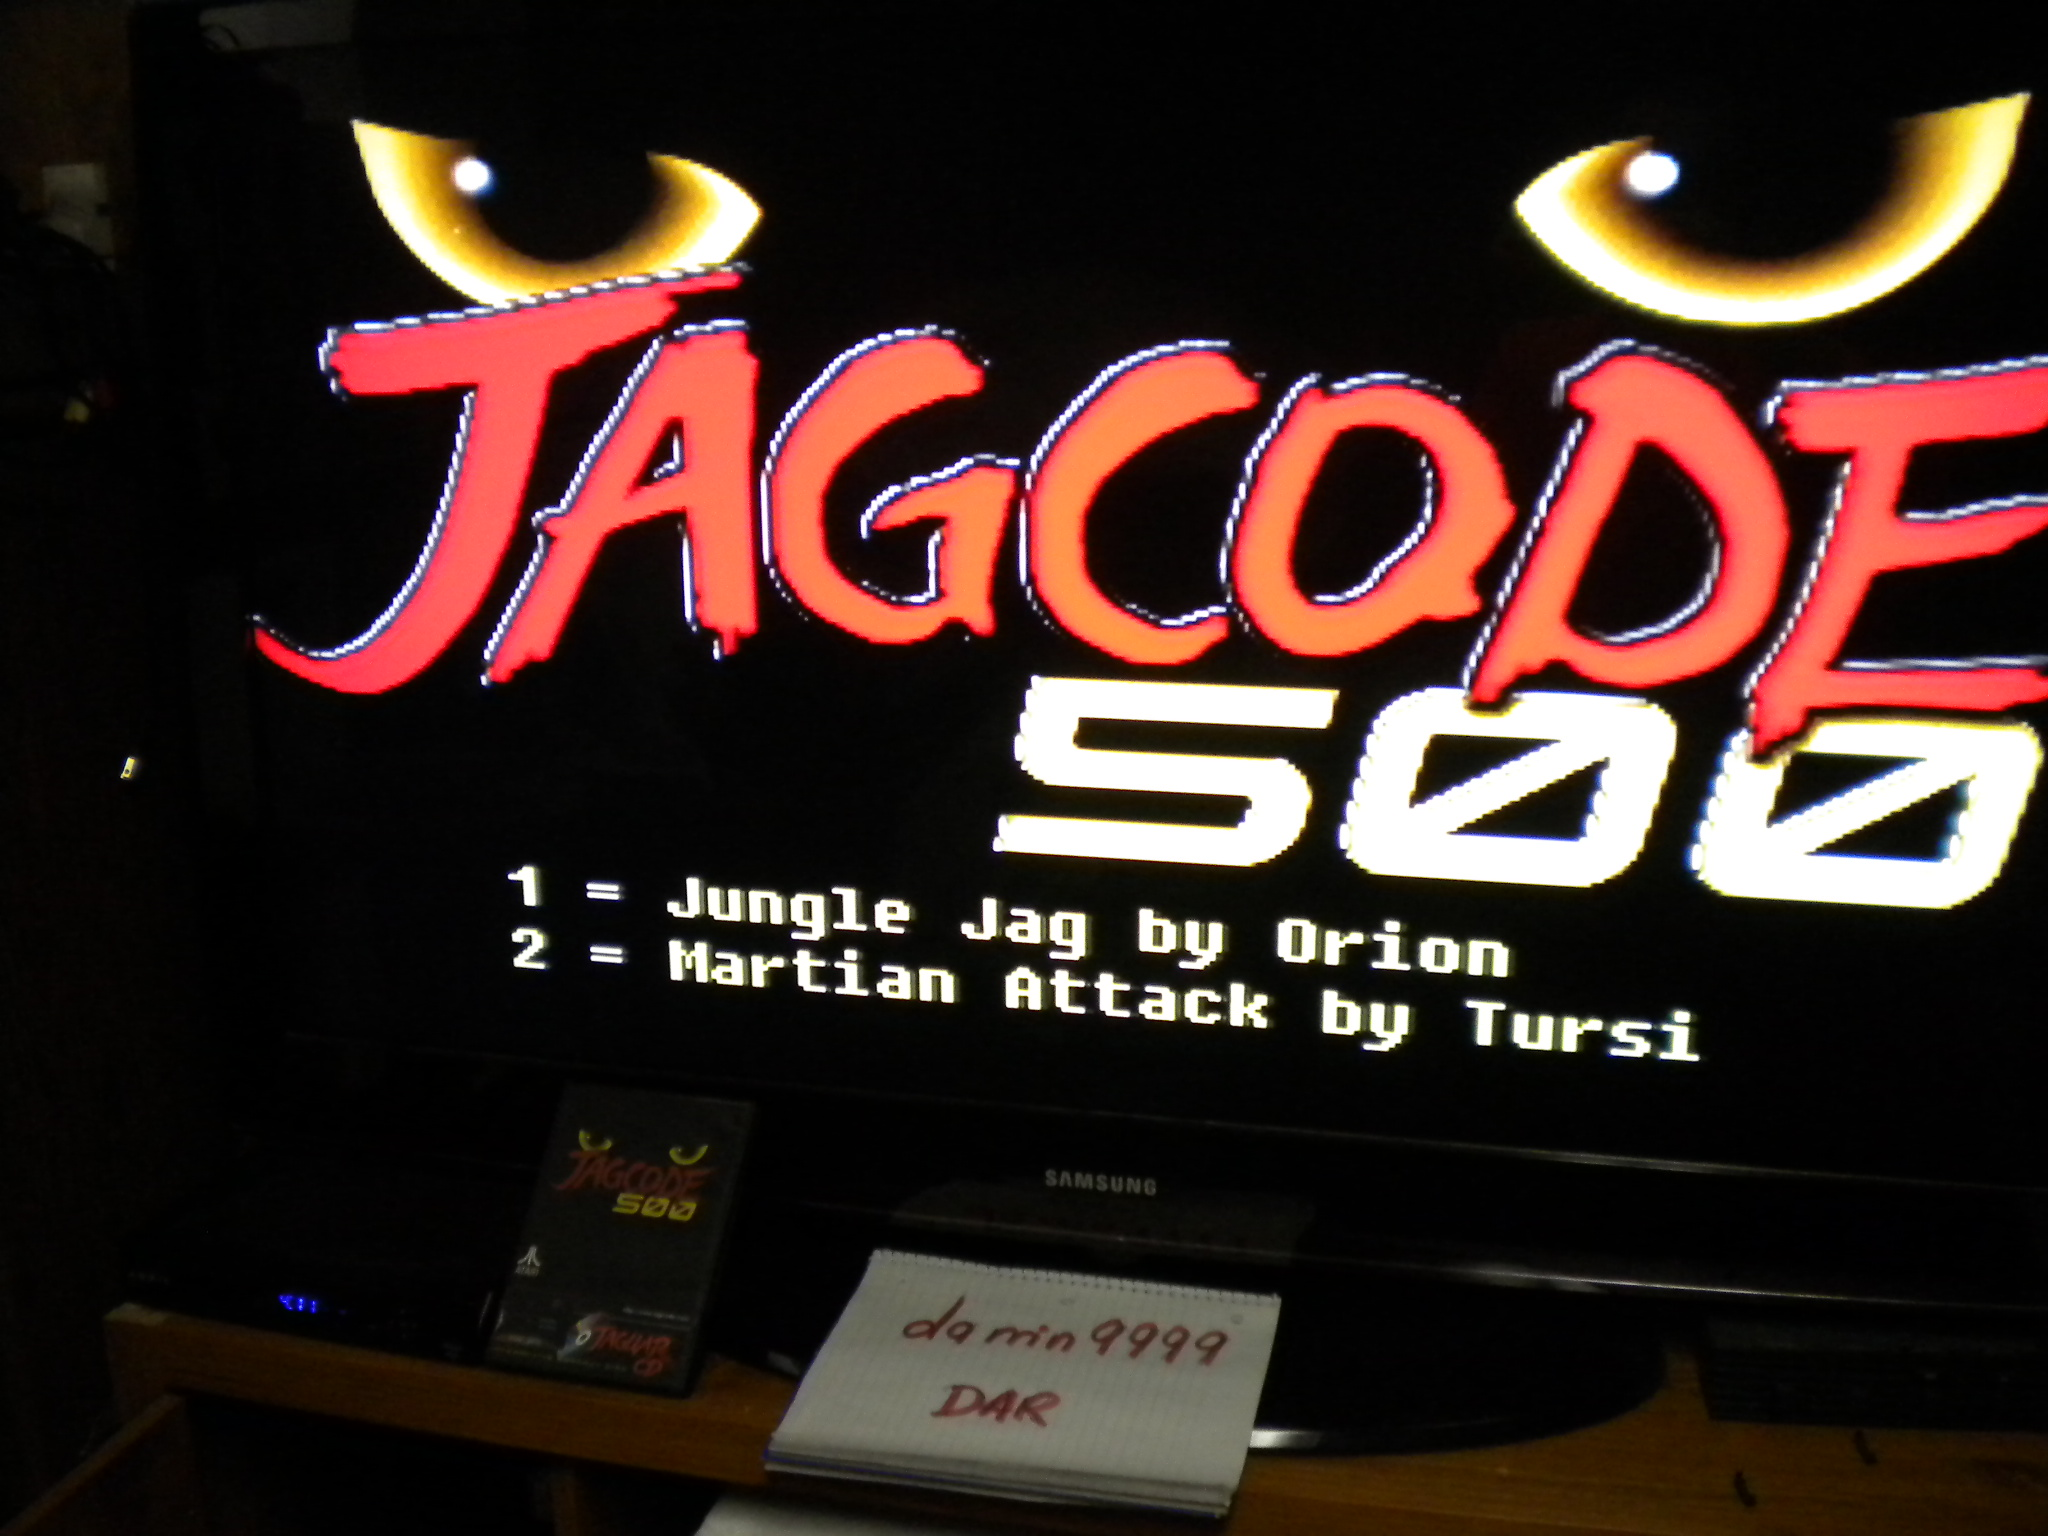 JagCode 500: Martian Attack 88,170 points